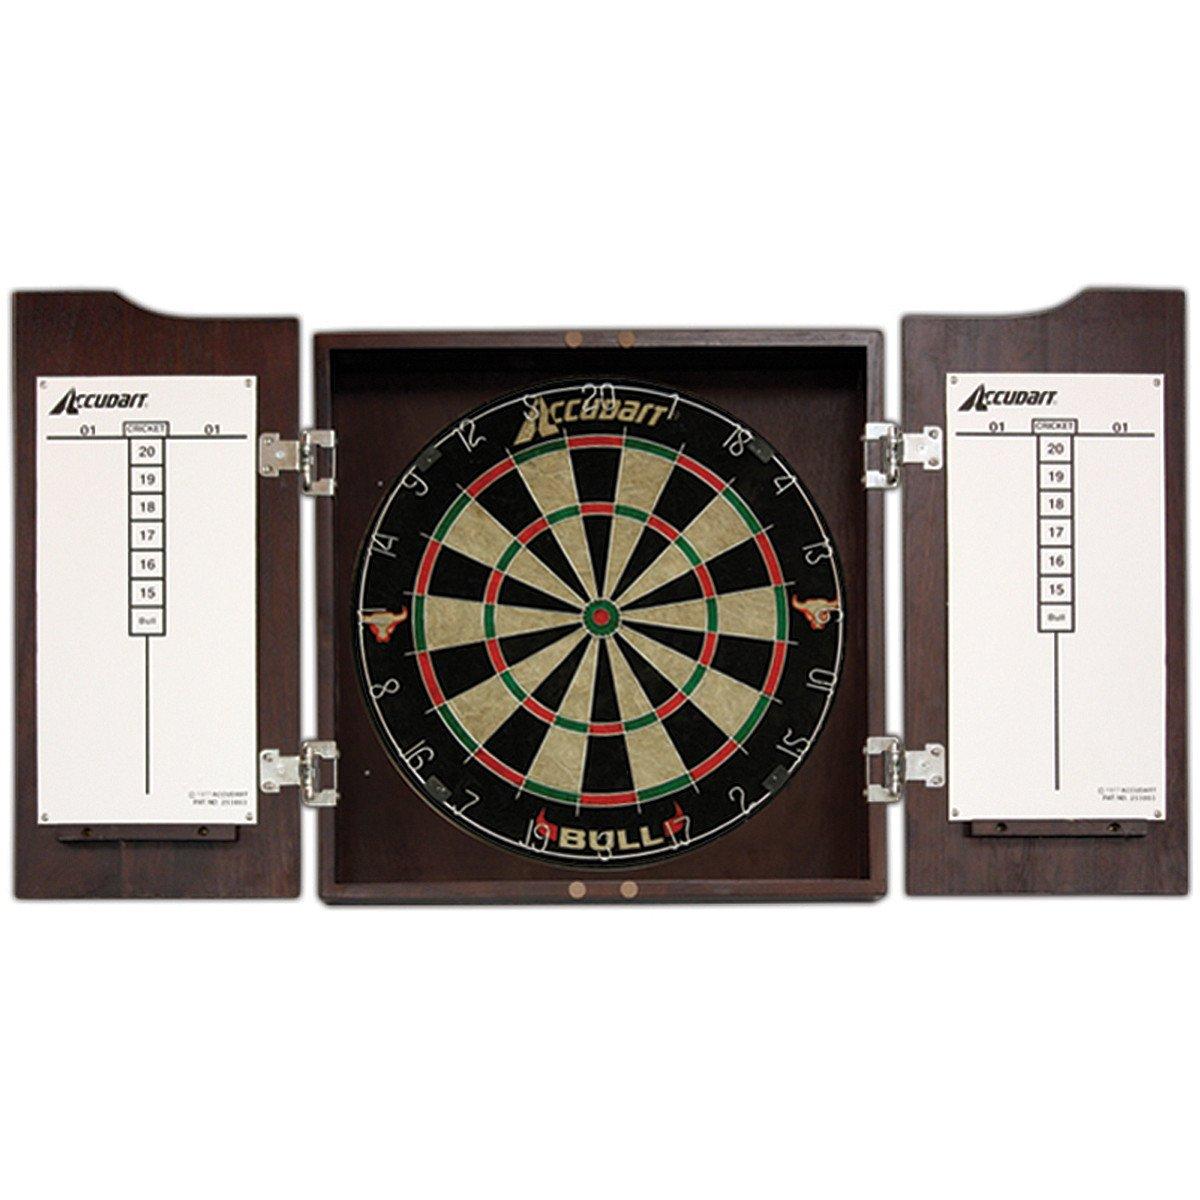 Accudart D4214 Bull Dartboard Cabinet and Set, Cabinets - Amazon ...